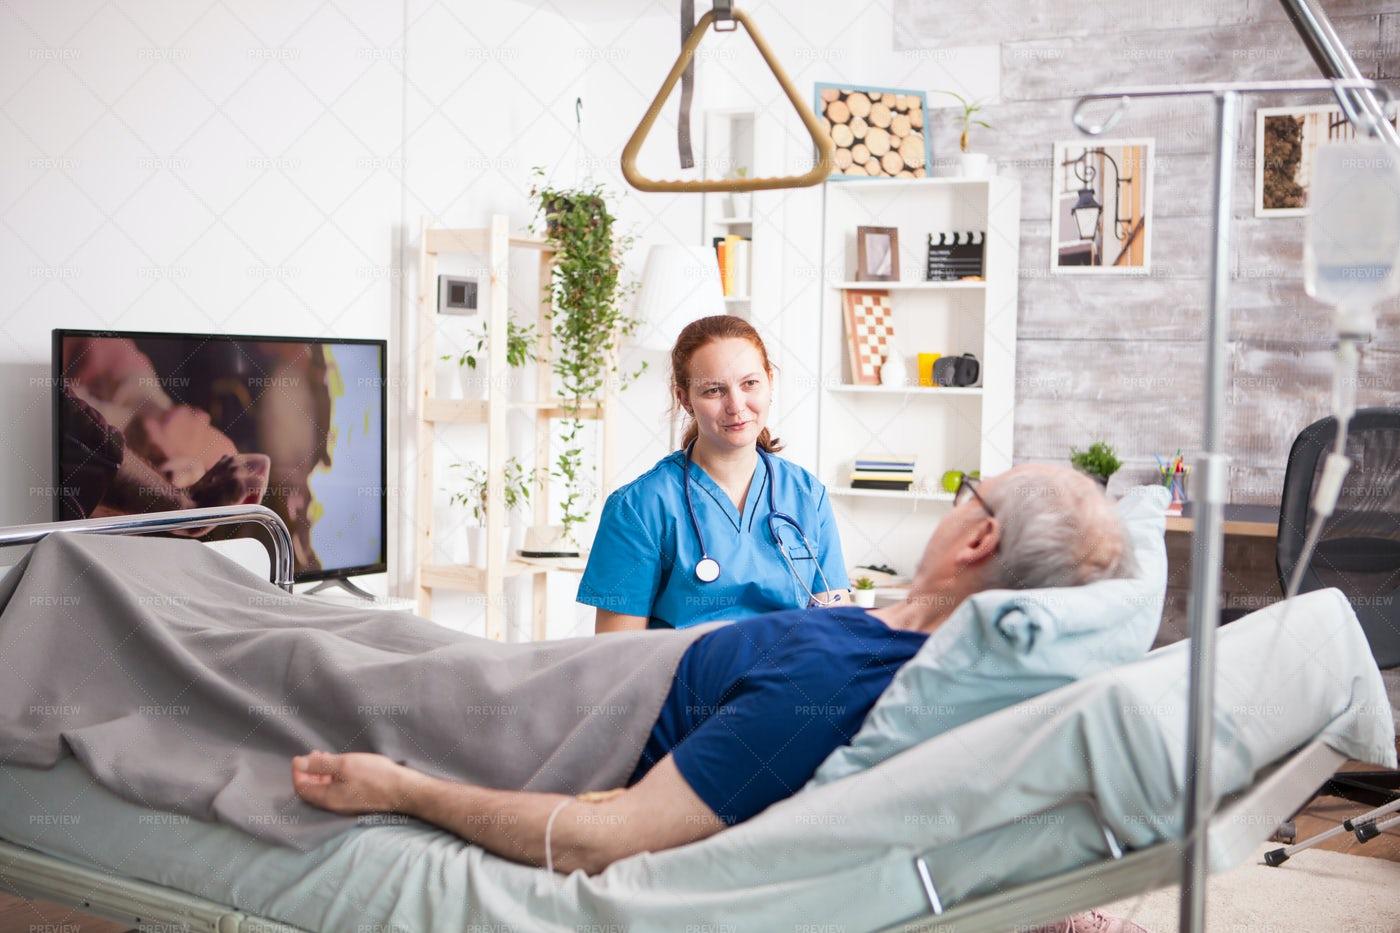 Man In Bed Beside Nurse: Stock Photos